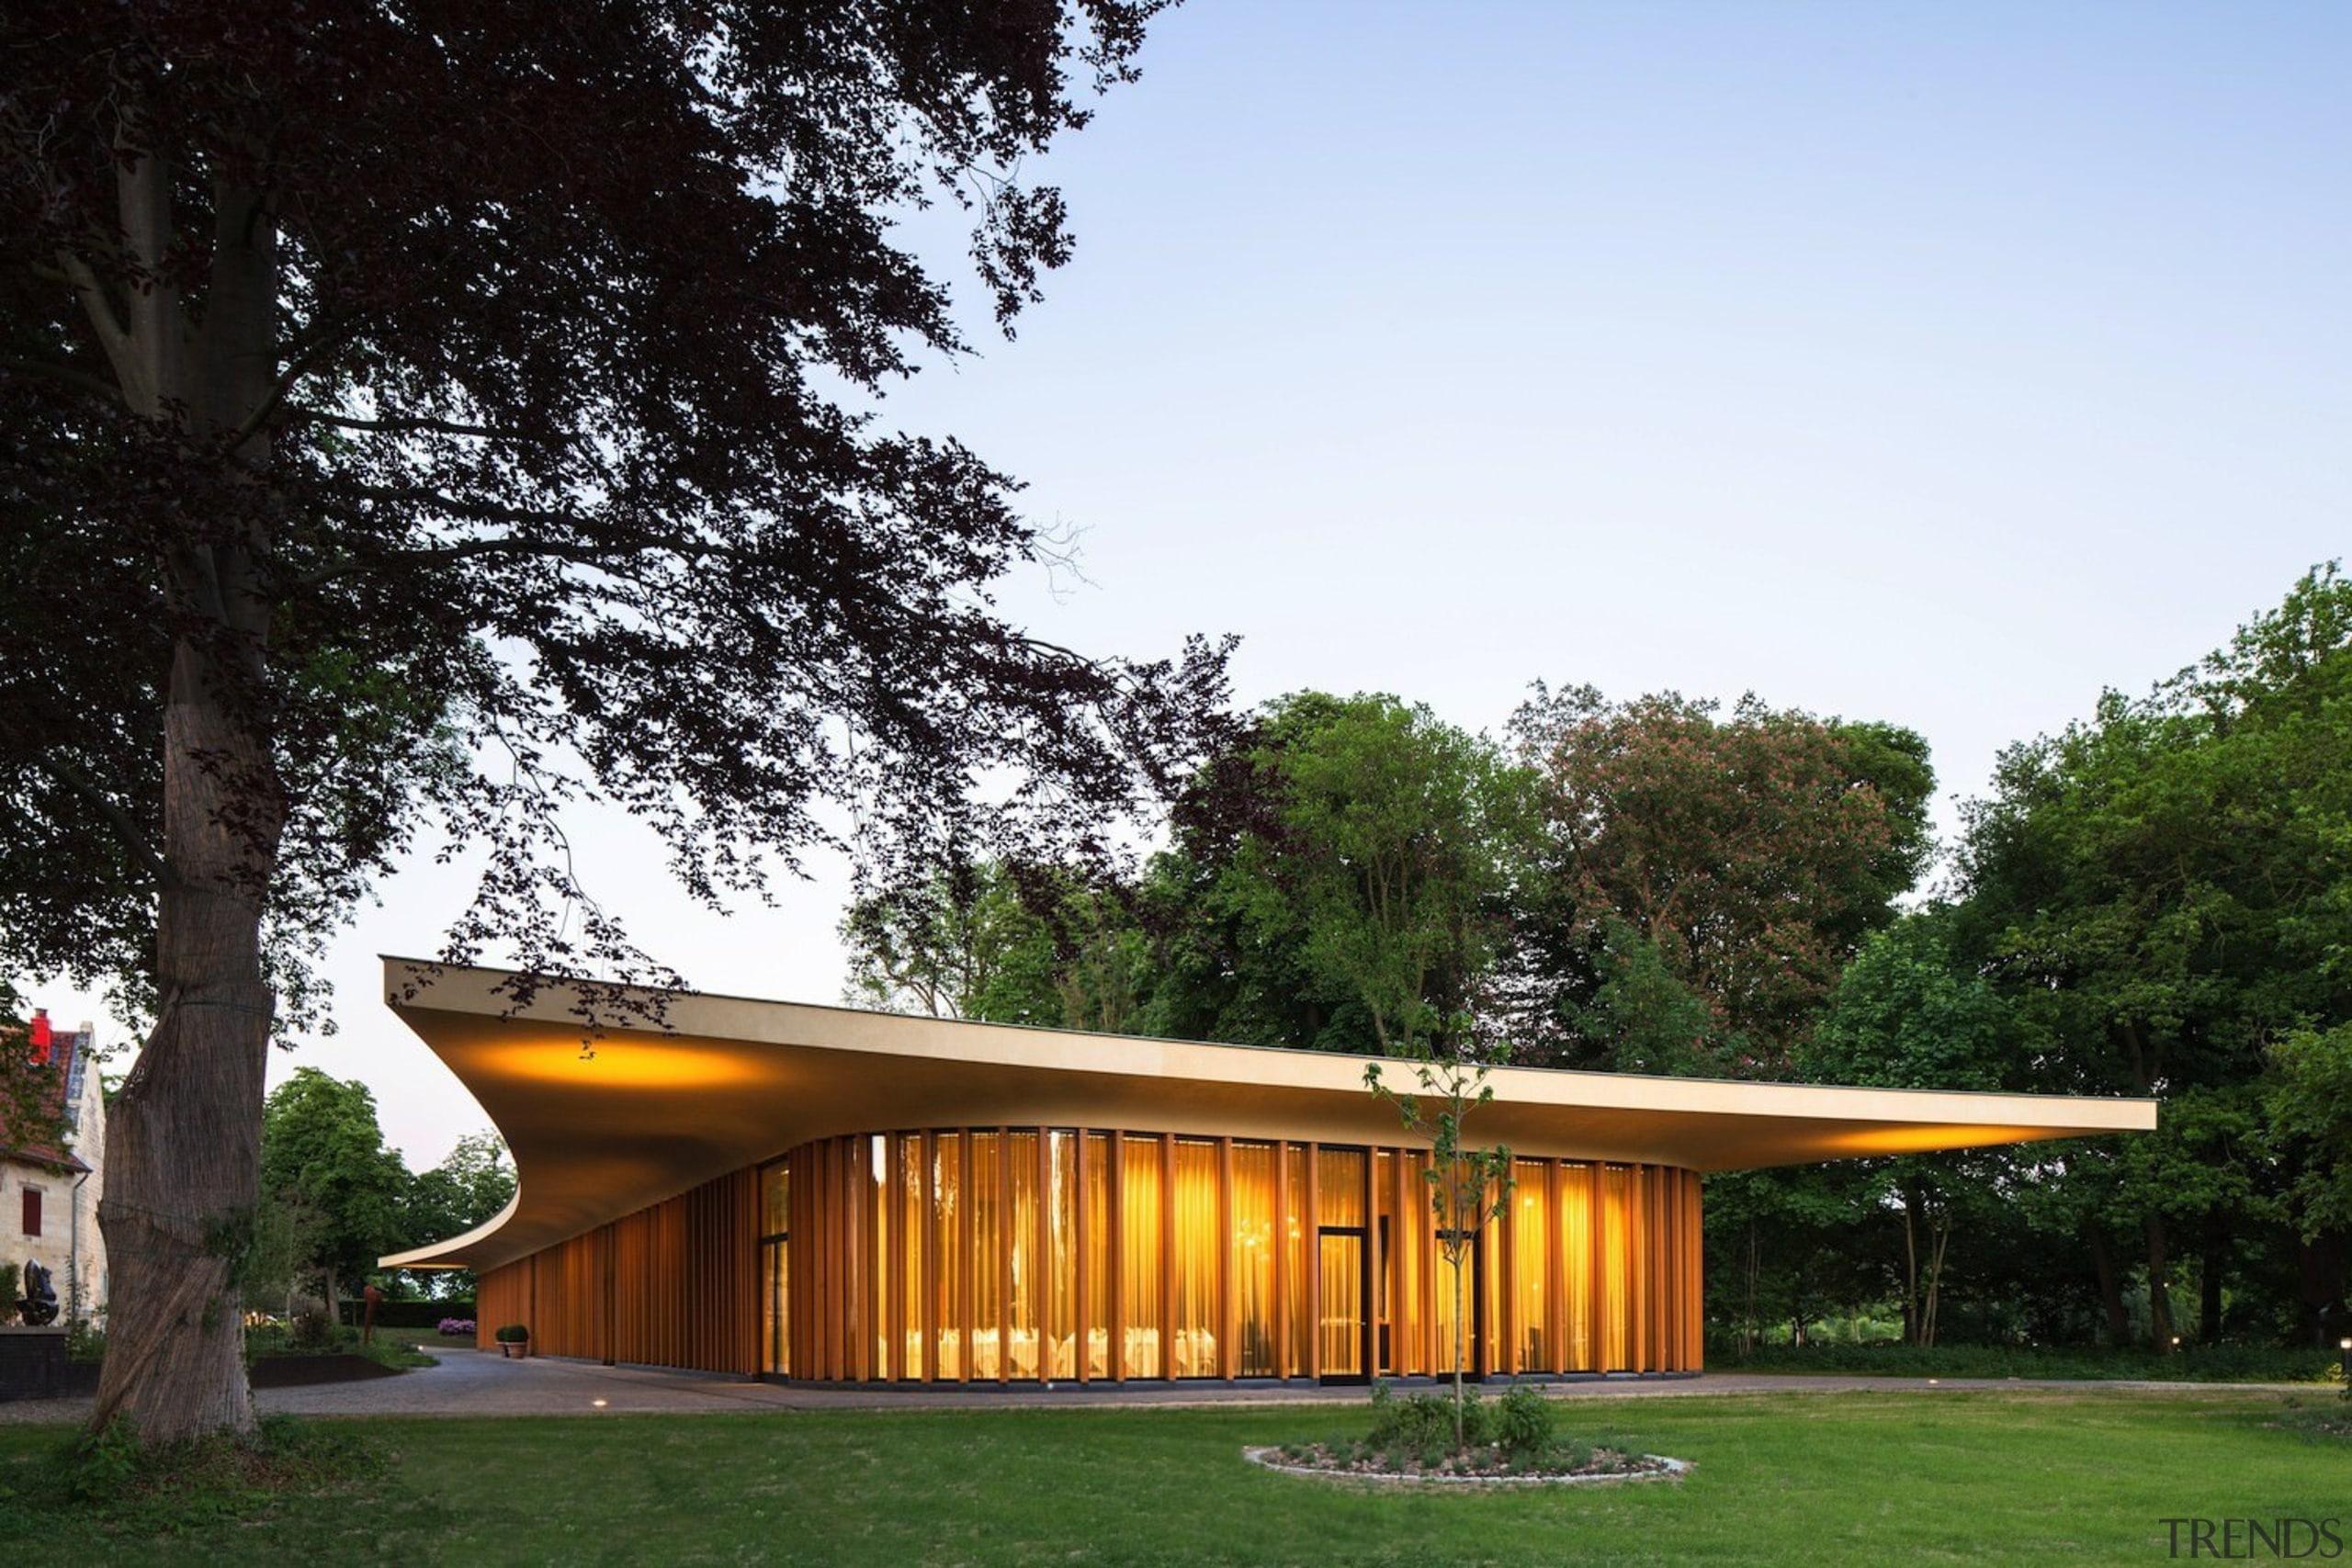 Architect: Meccanoo architecture, cottage, facade, home, house, pavilion, real estate, roof, sky, white